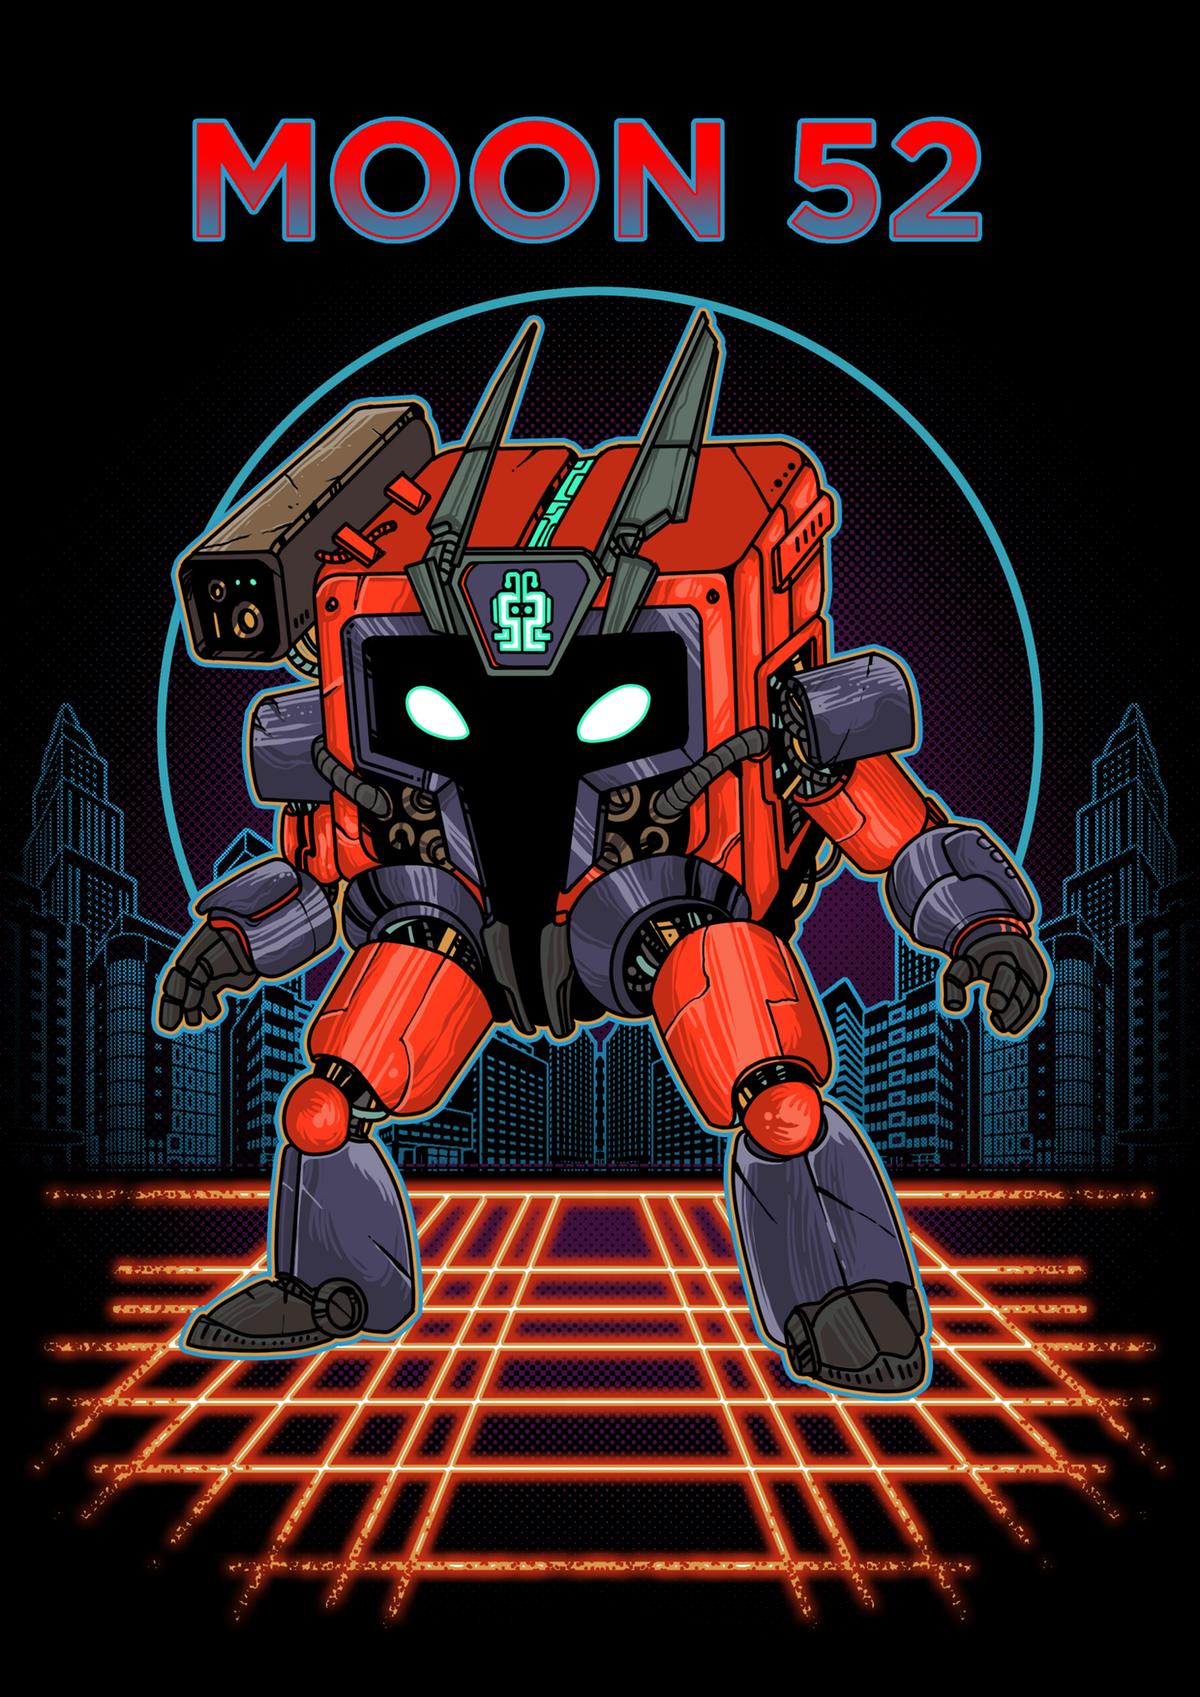 Create Robot Illustration Involving the likes of my Logo